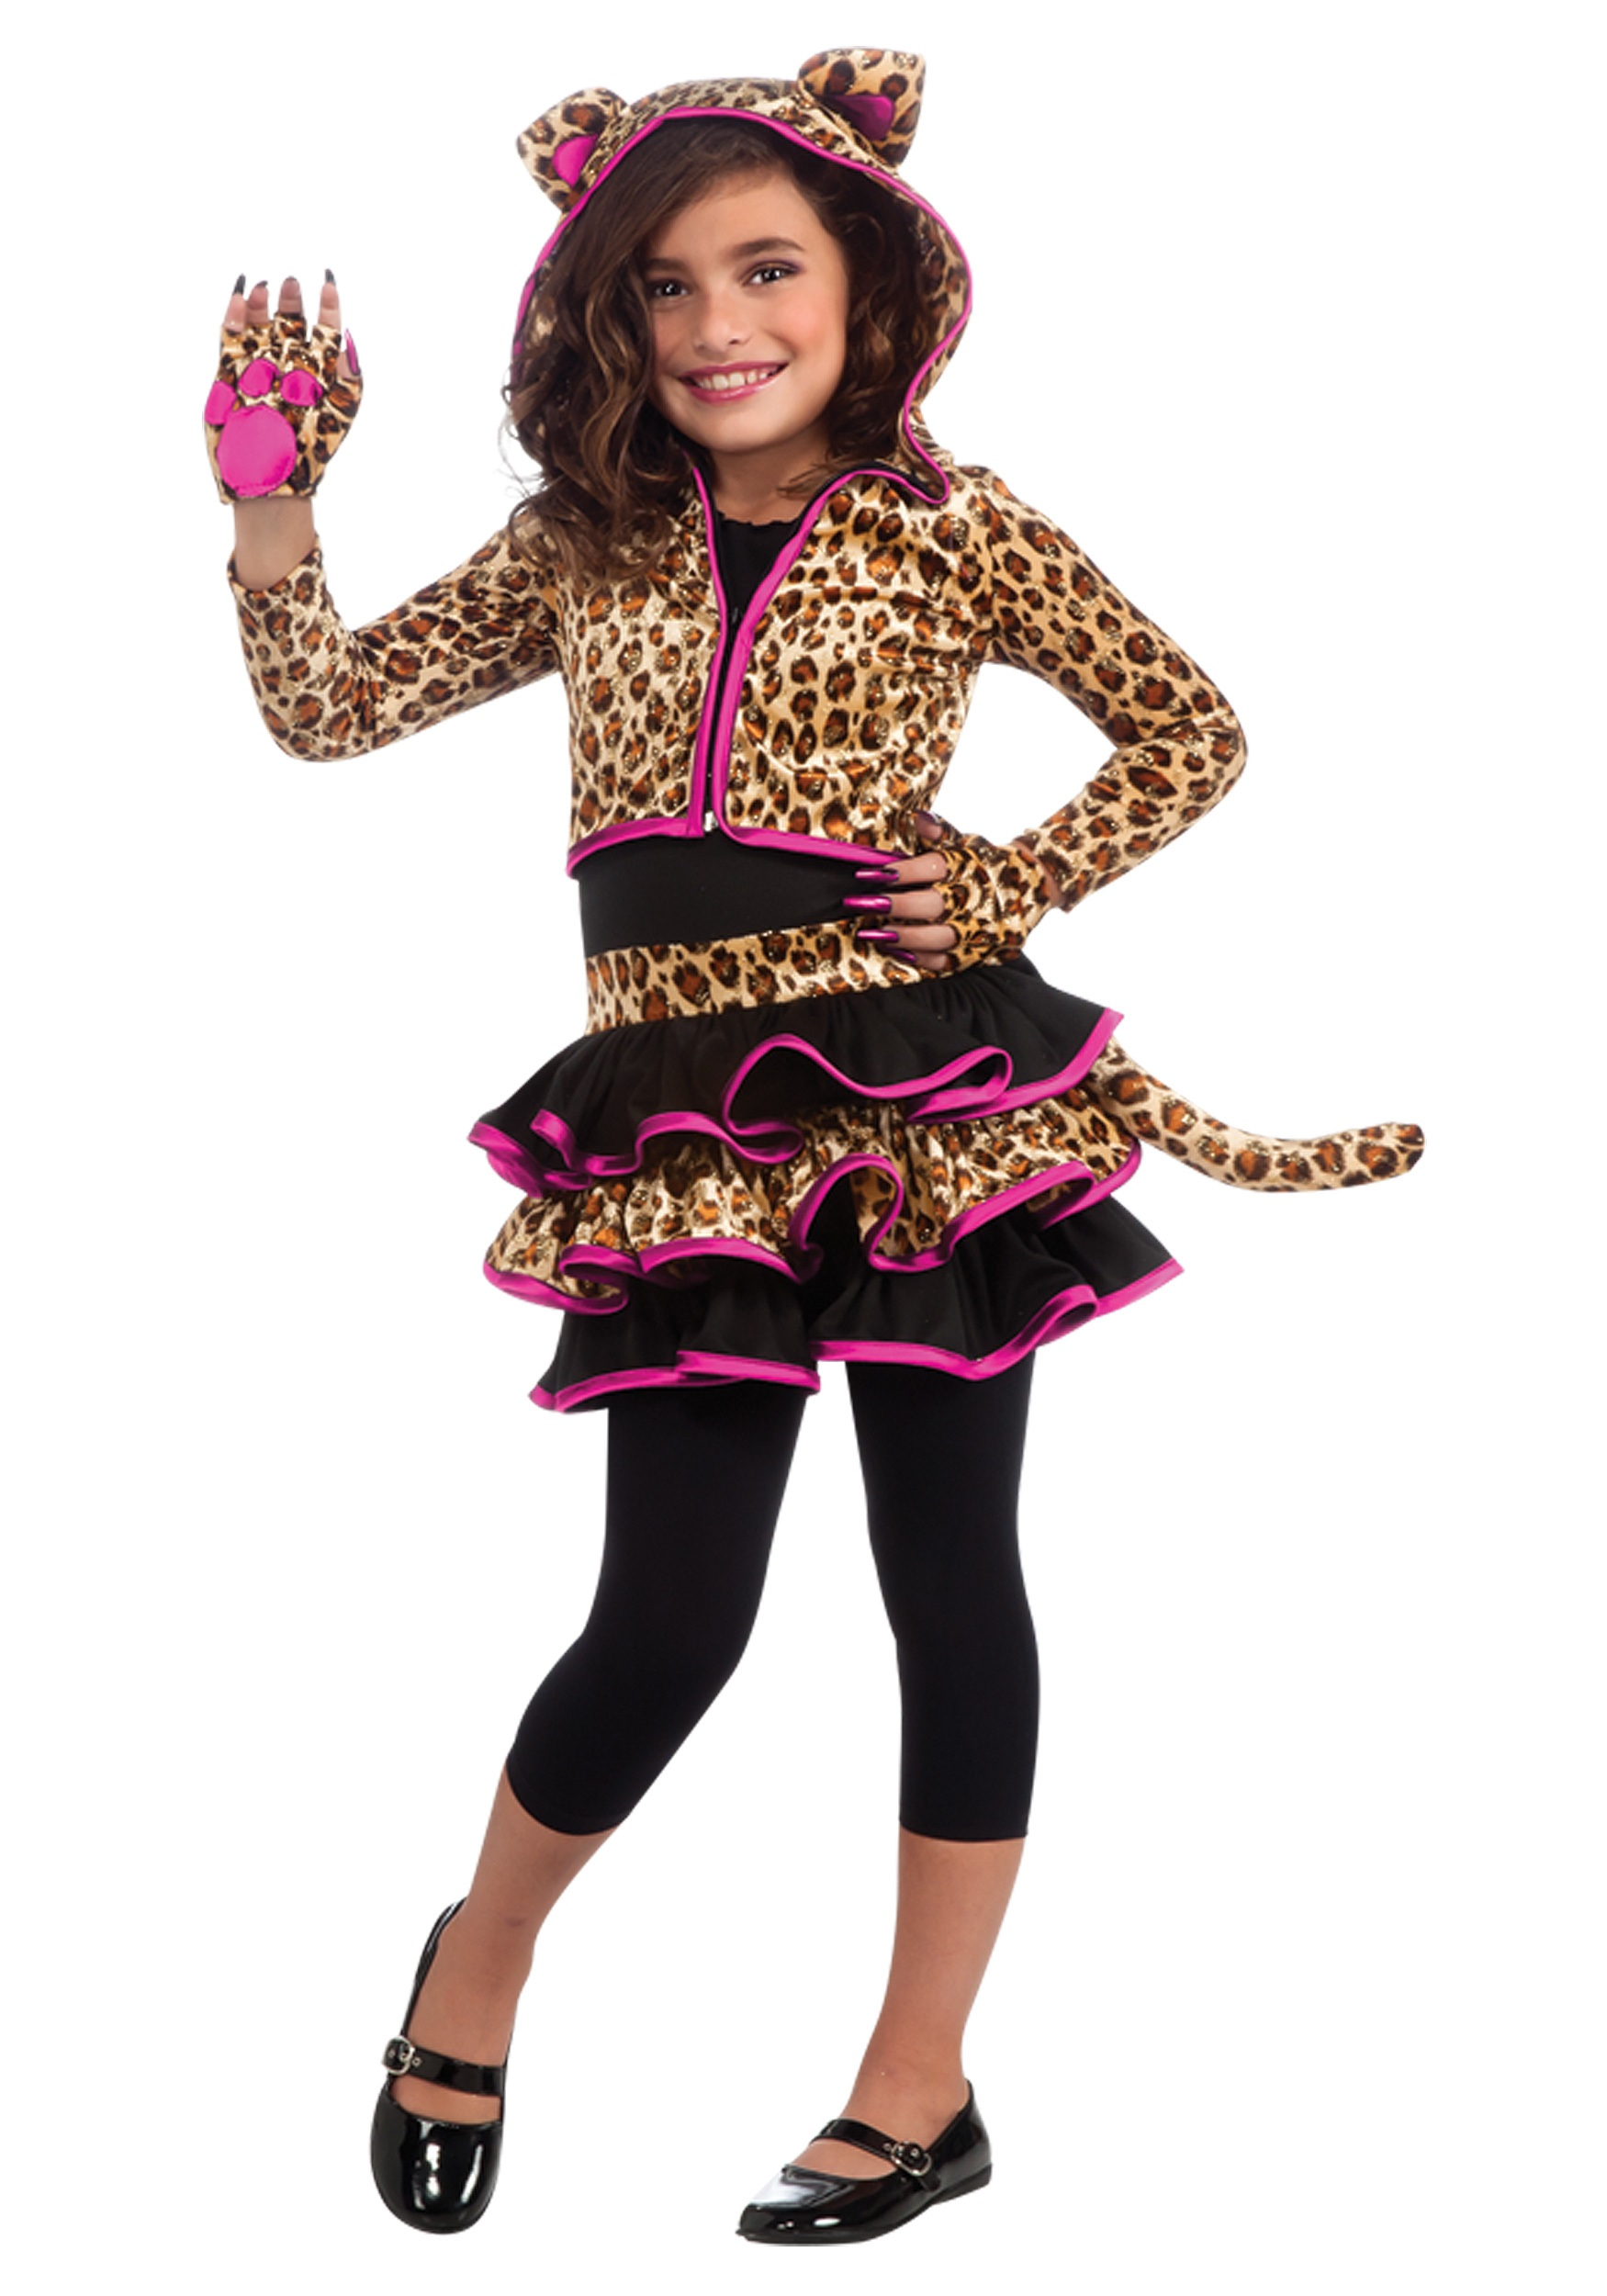 Girls Fierce Leopard Hoodie Costume - Animals Costumes, Kids Costumes